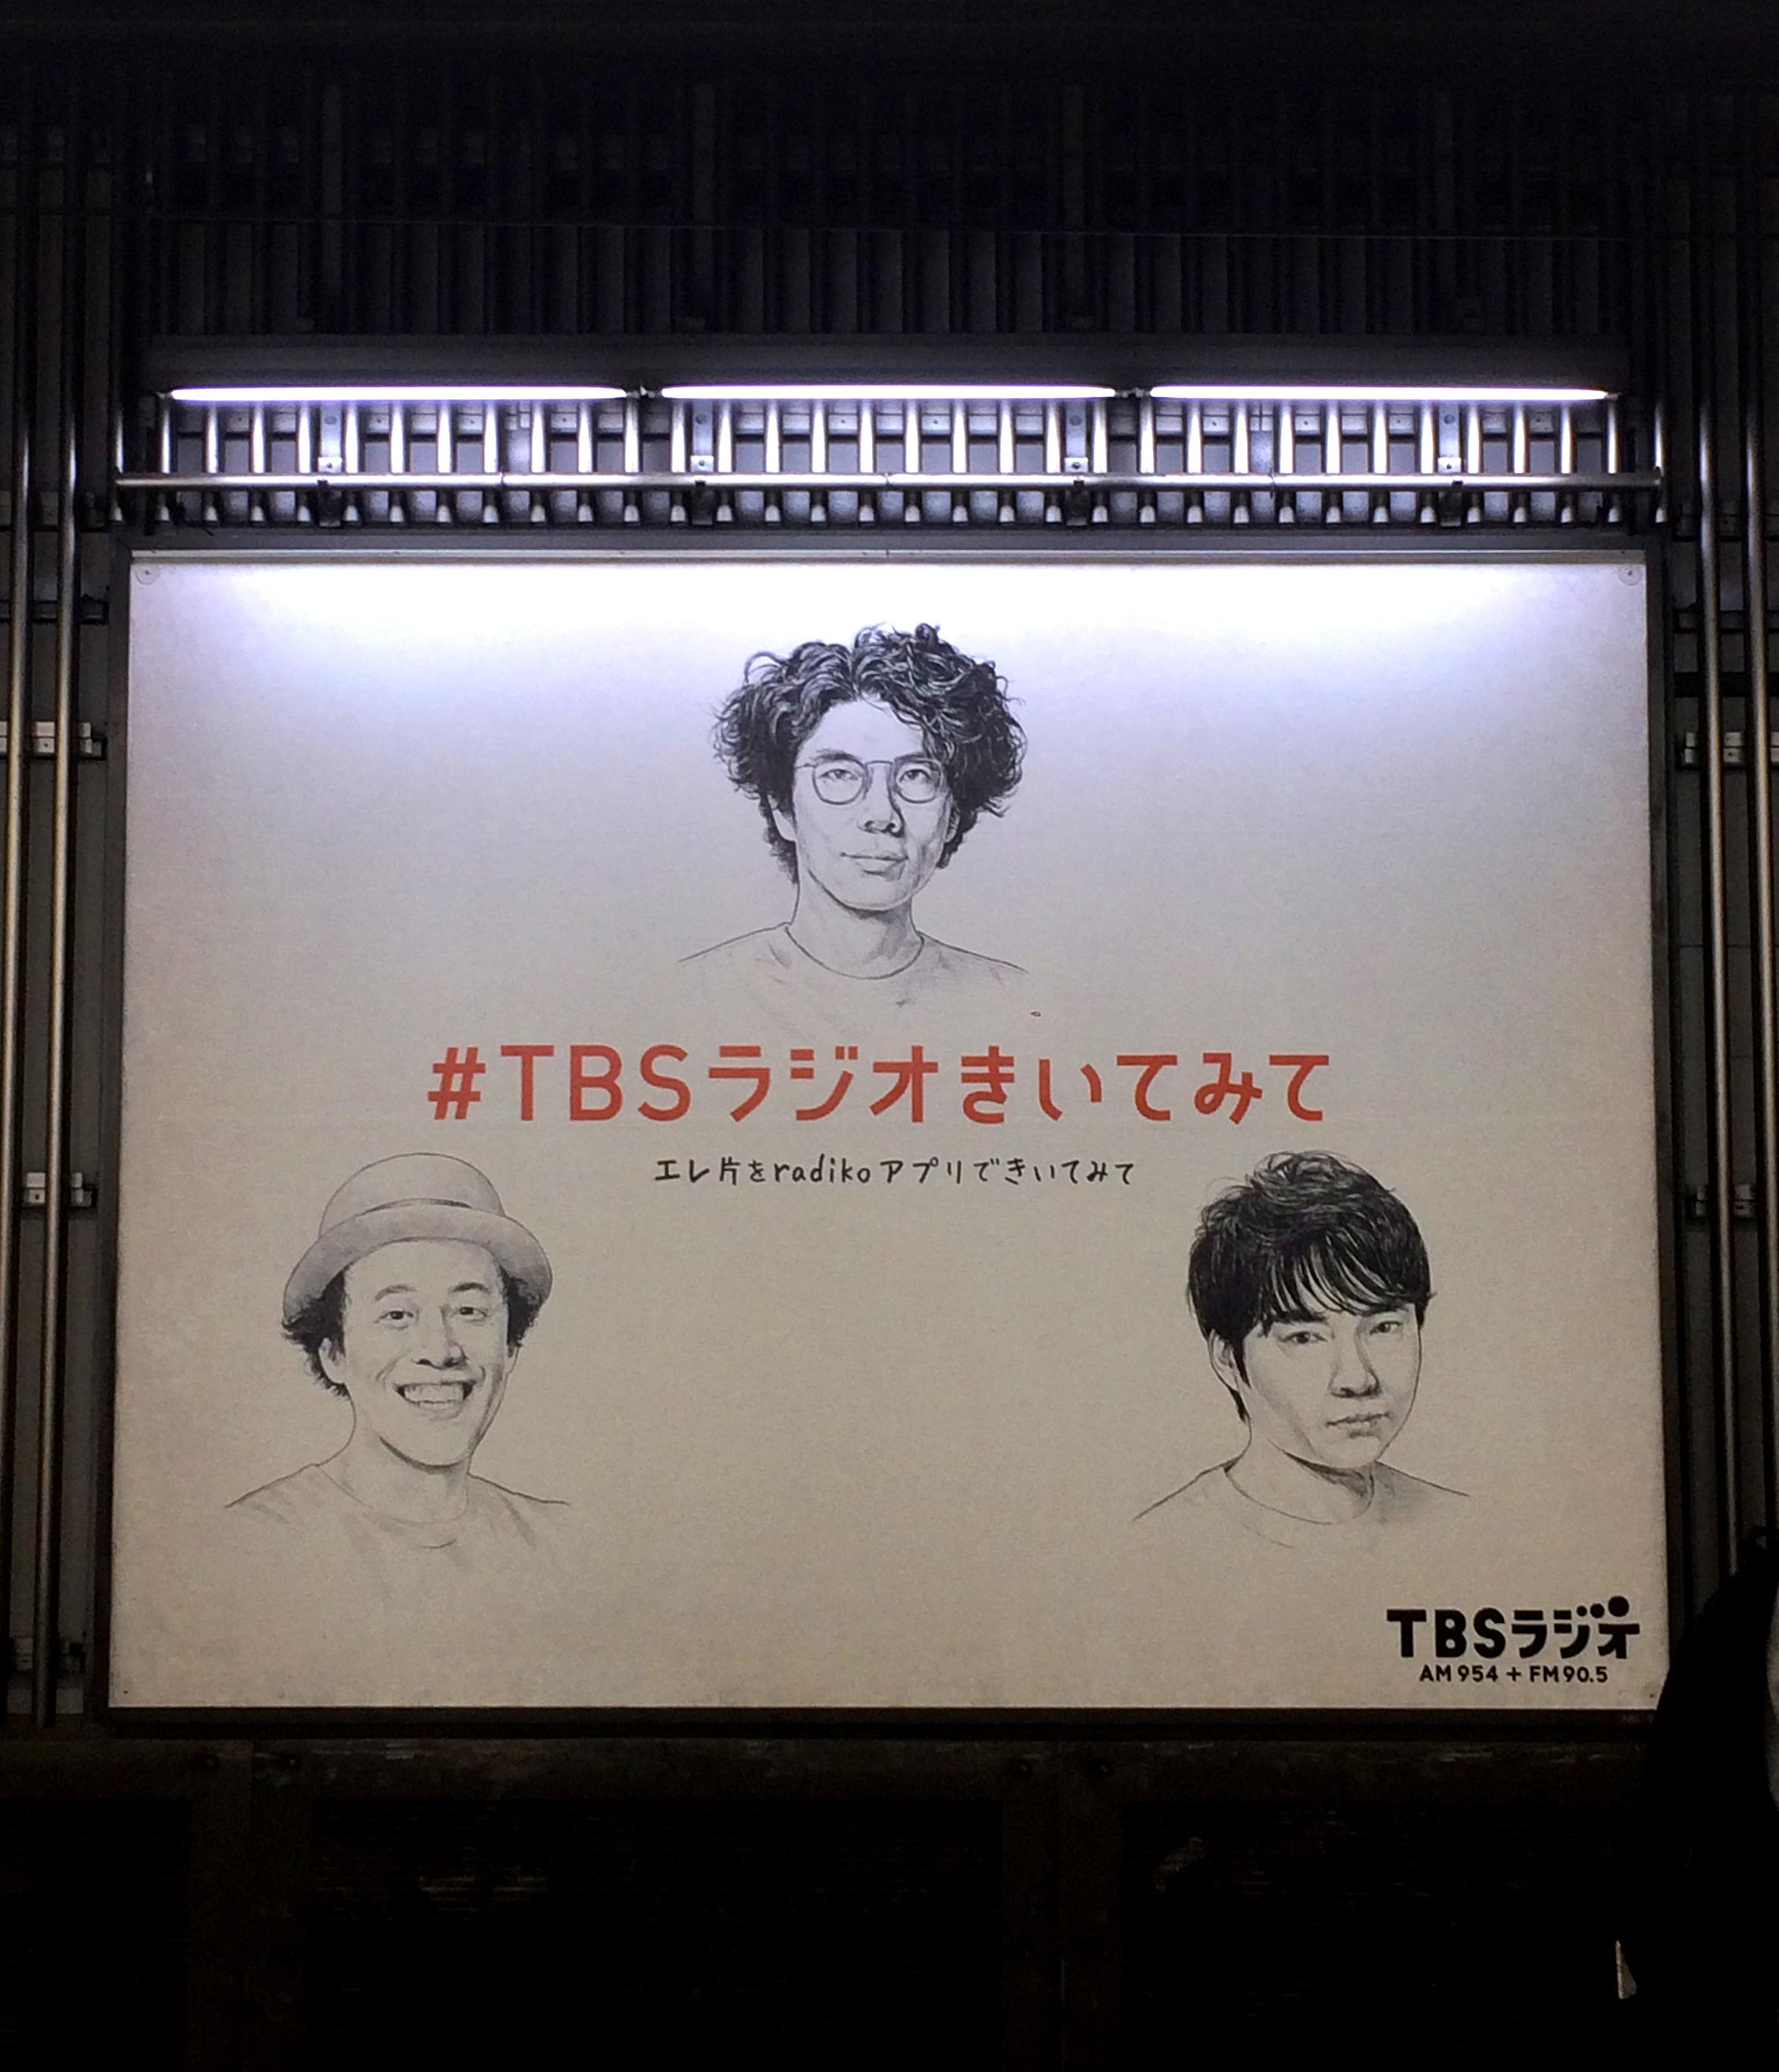 TBS RADIO / #TBSラジオきいてみて 広告キャンペーン4